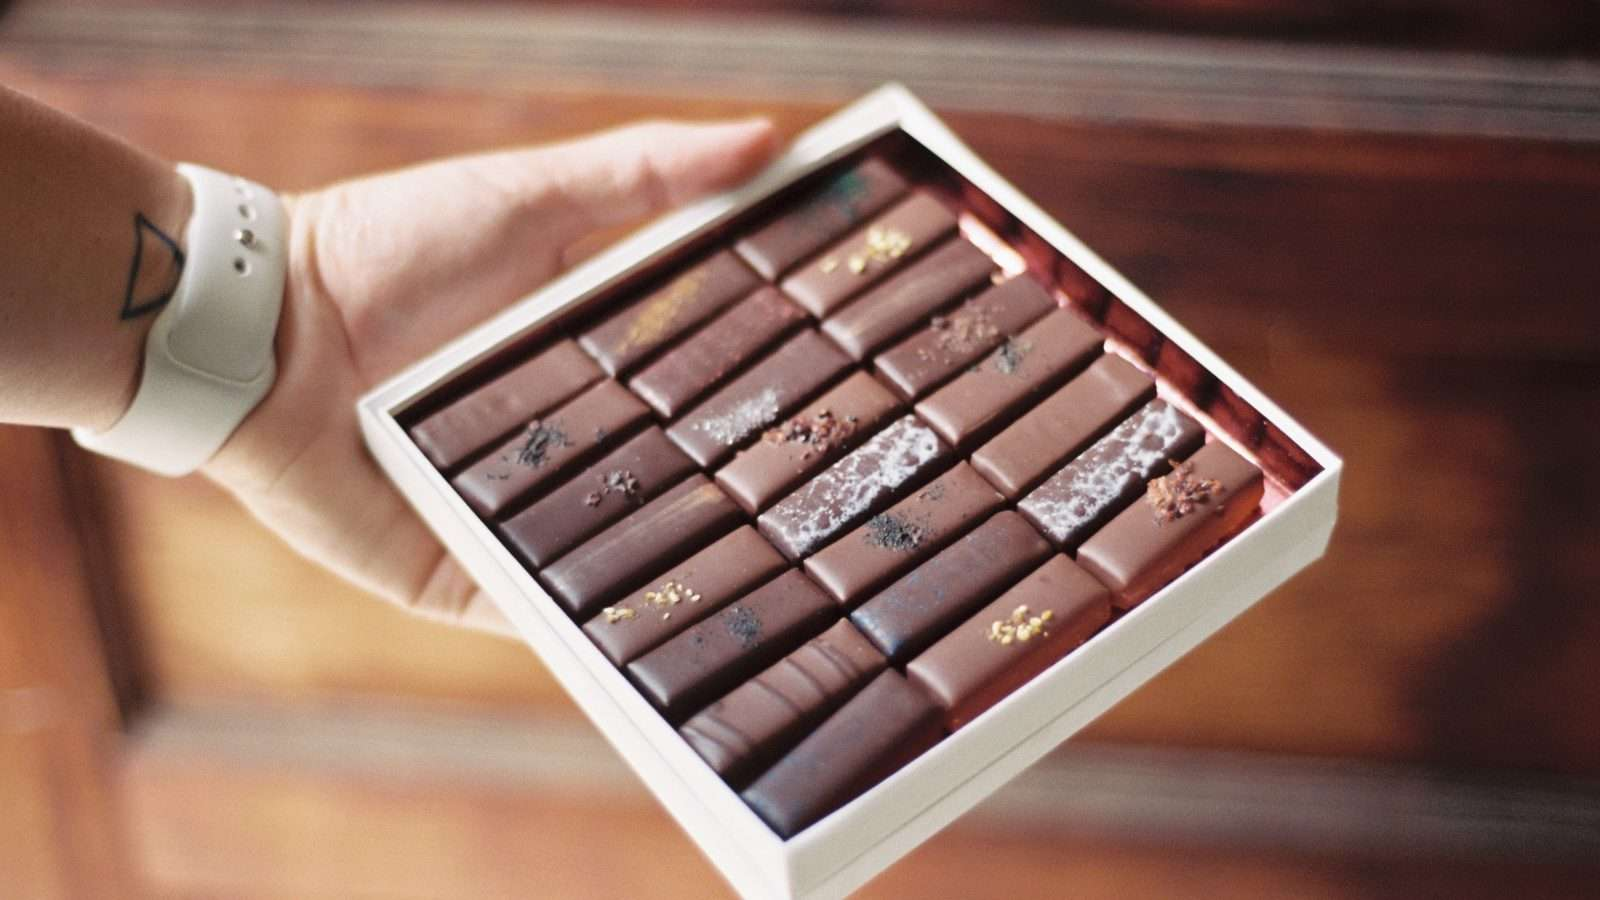 Man holding a box of chocolates